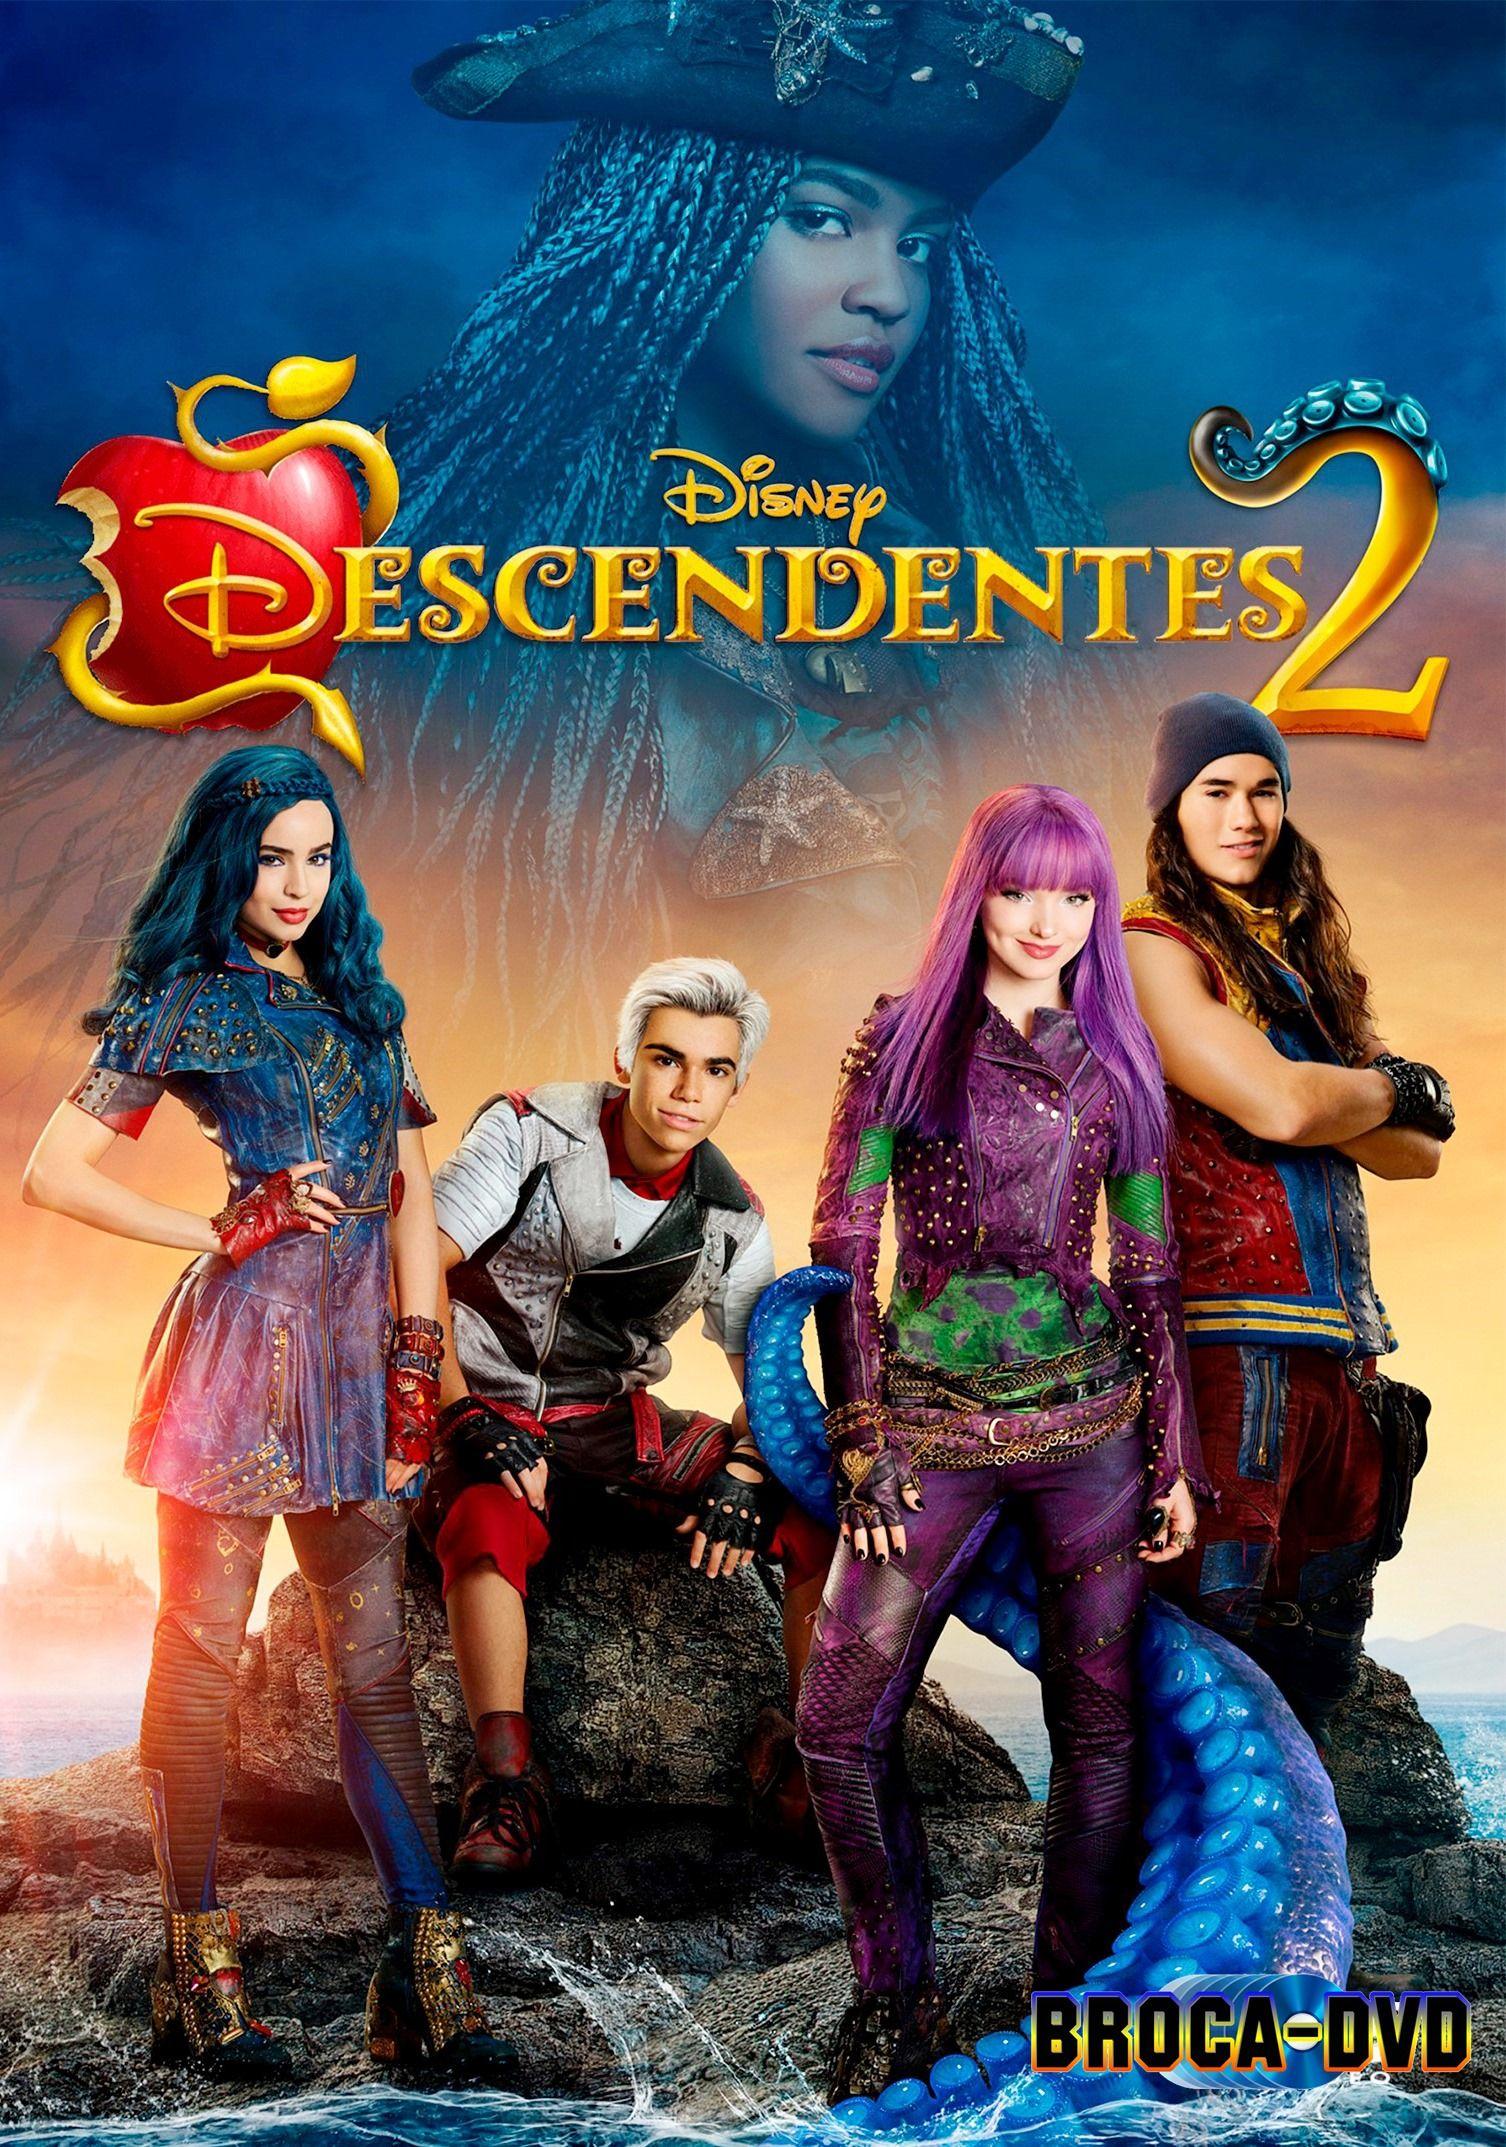 Descendentes 2 Com Imagens Filme Disney Channel Descendentes